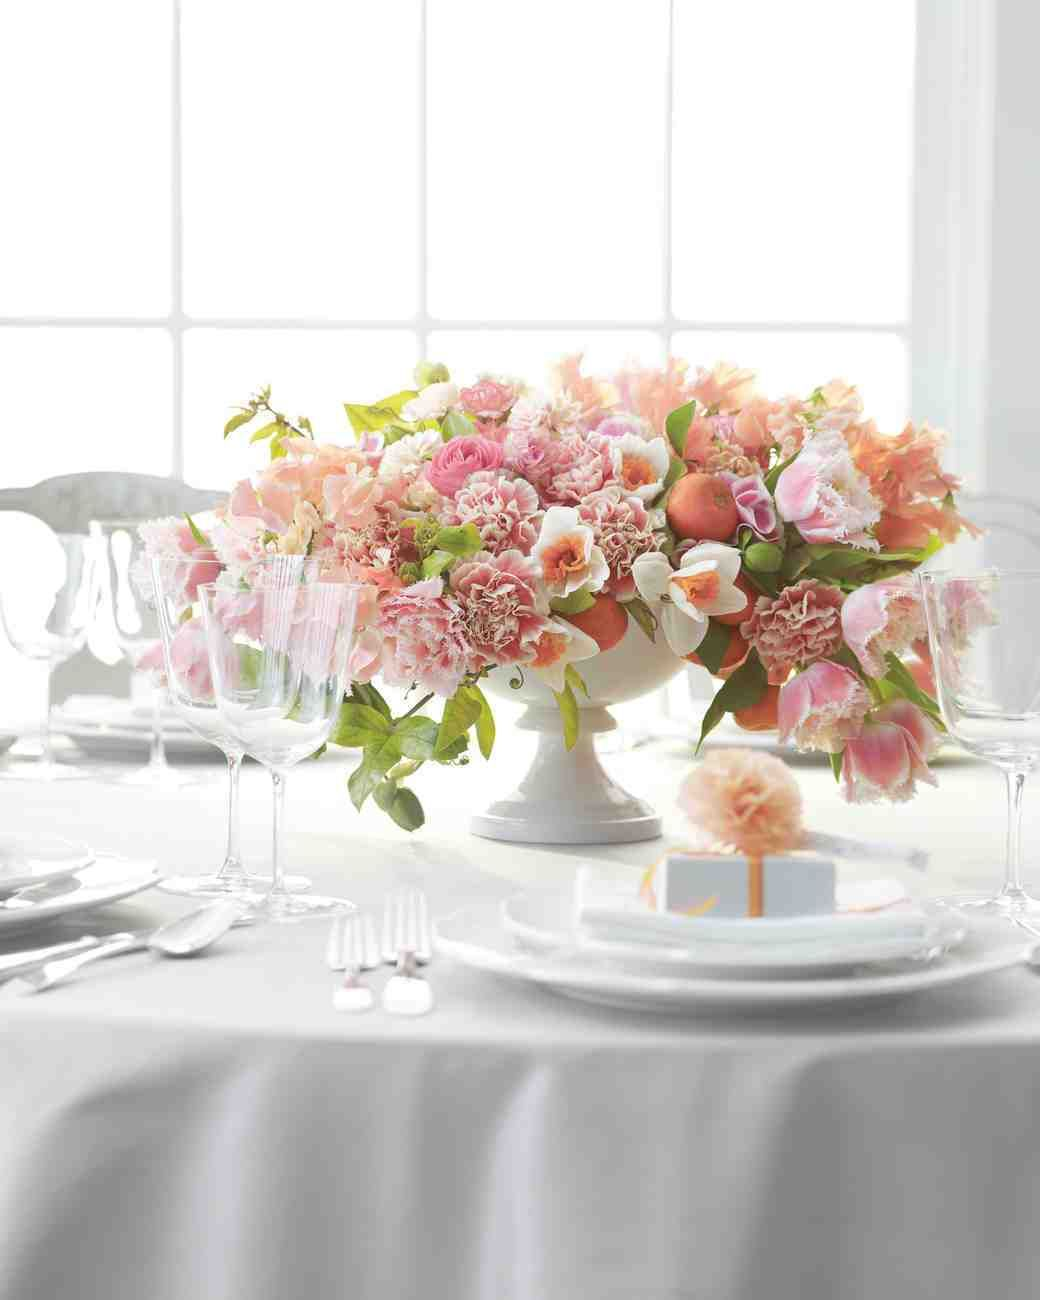 Carnation Wedding Centerpiece   Floral   Pinterest   Pansies, Shrub ...